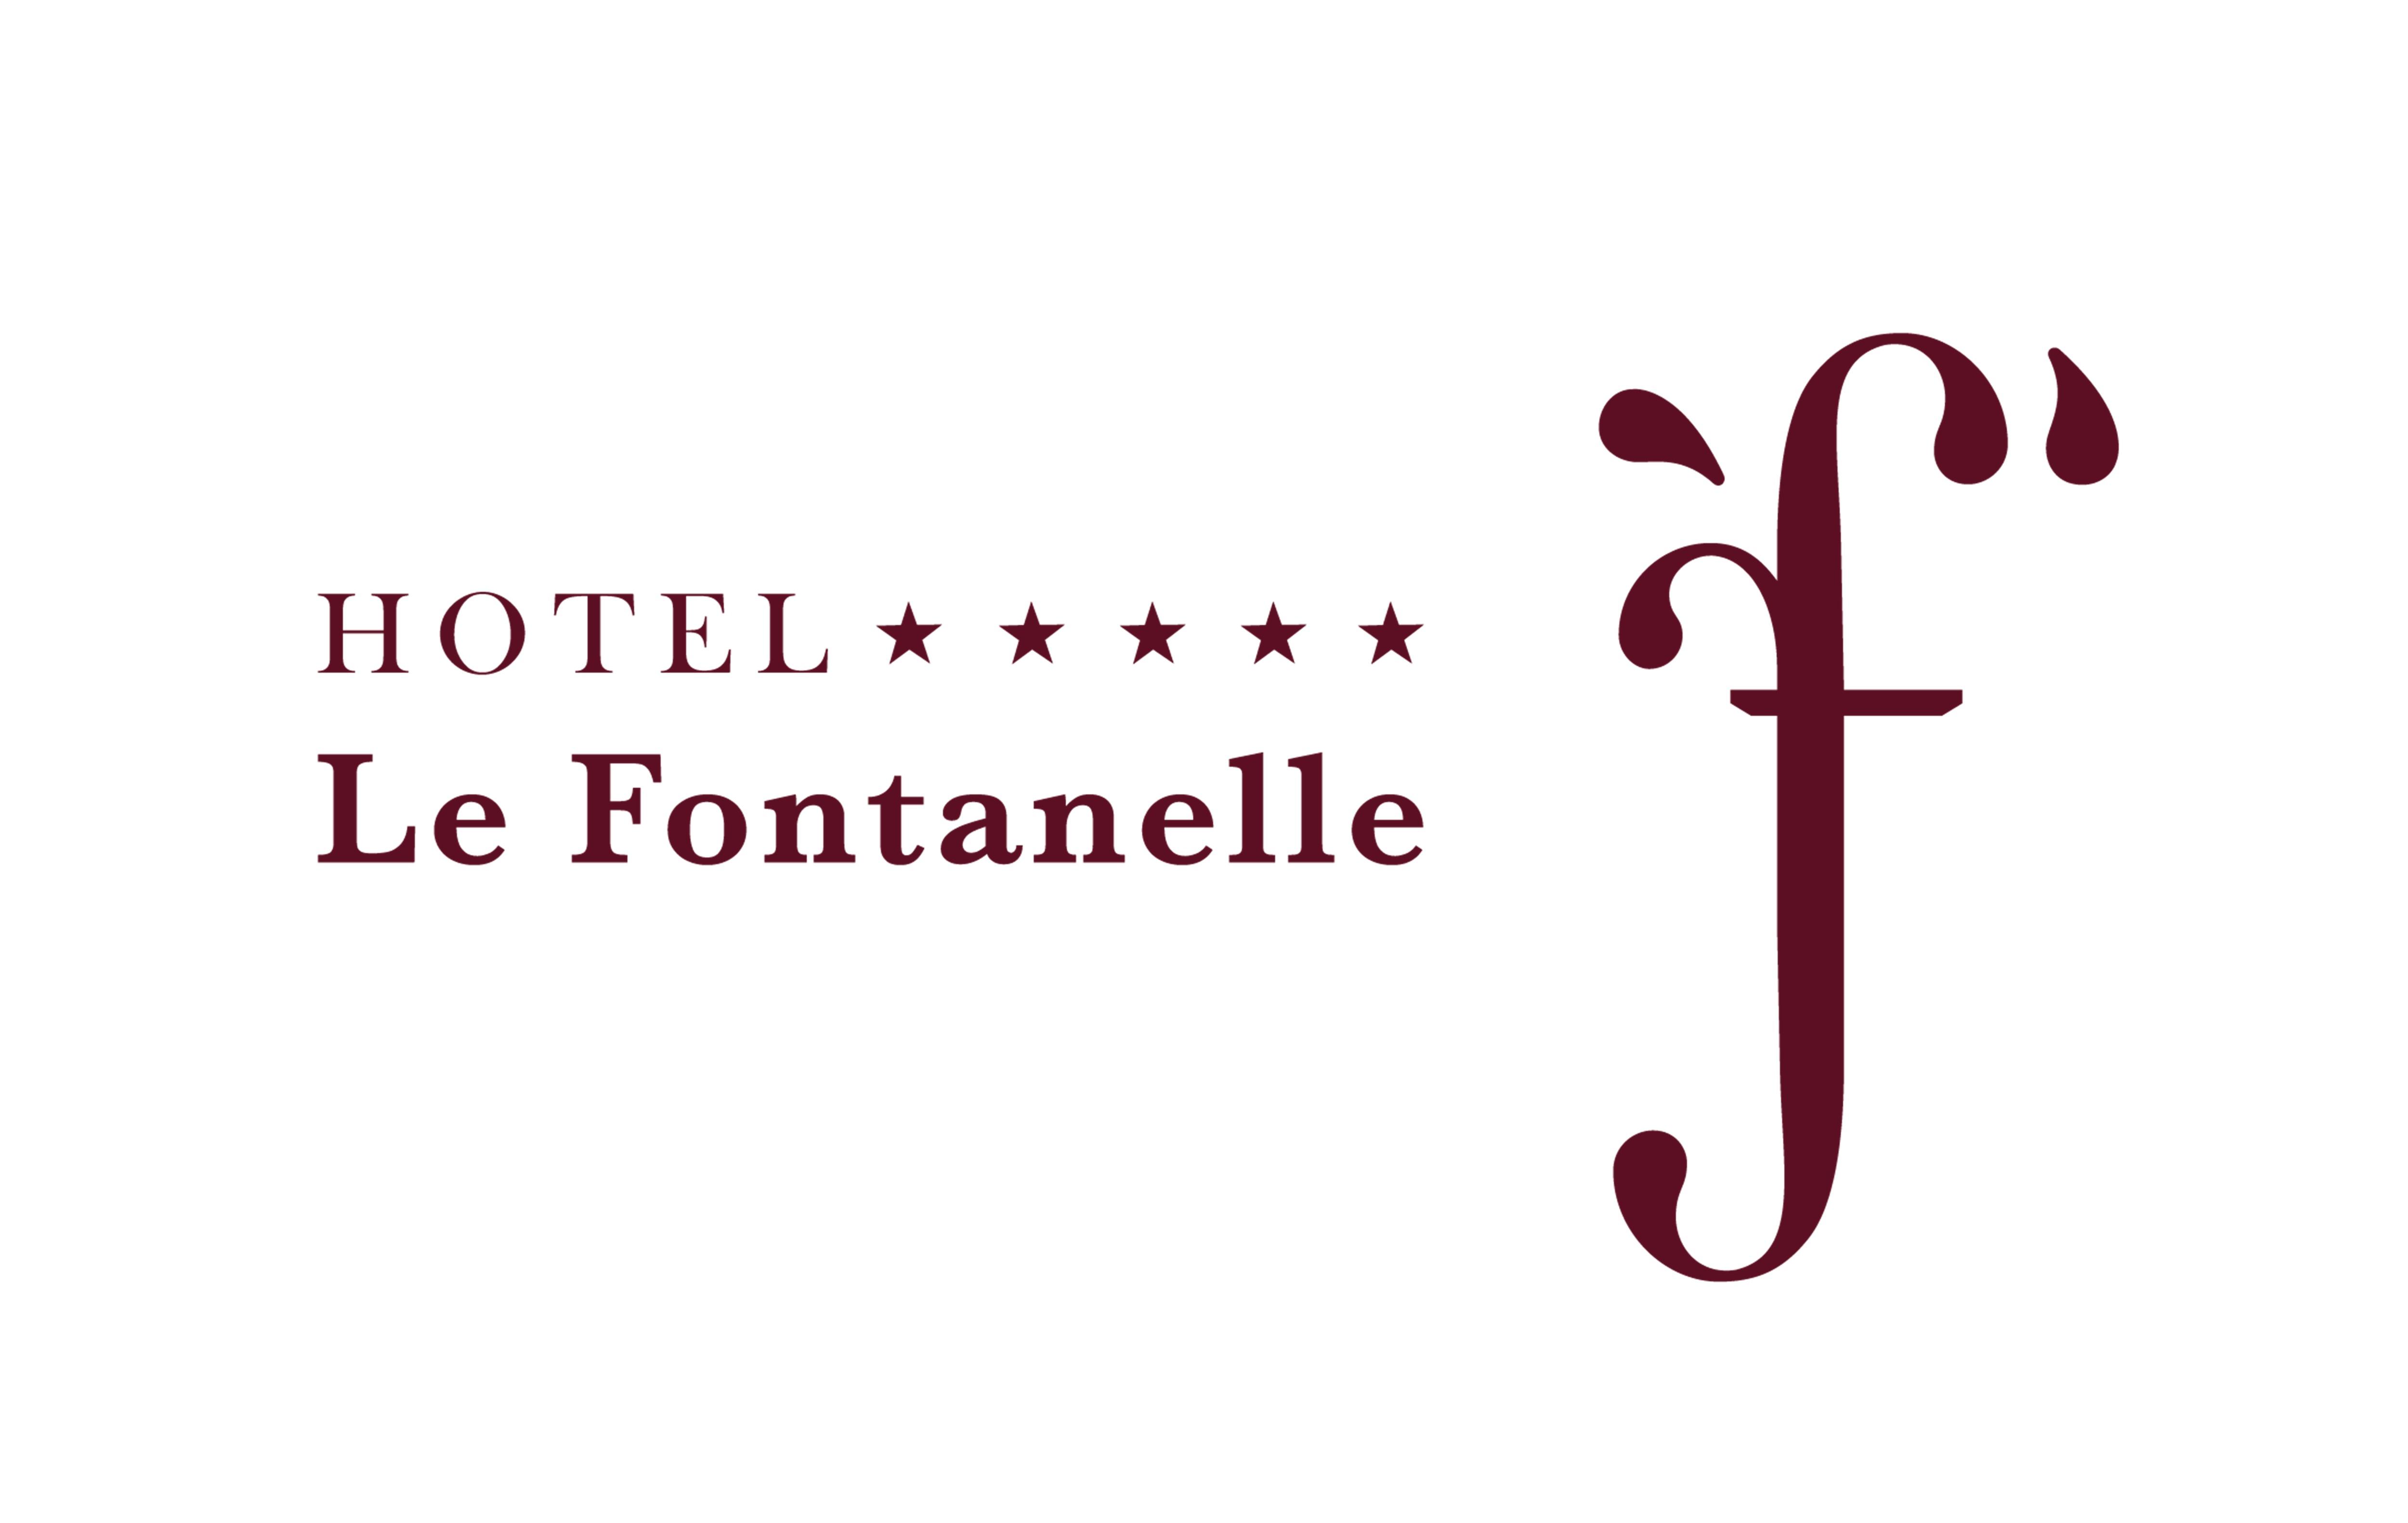 Hotel Le Fontanelle SpA